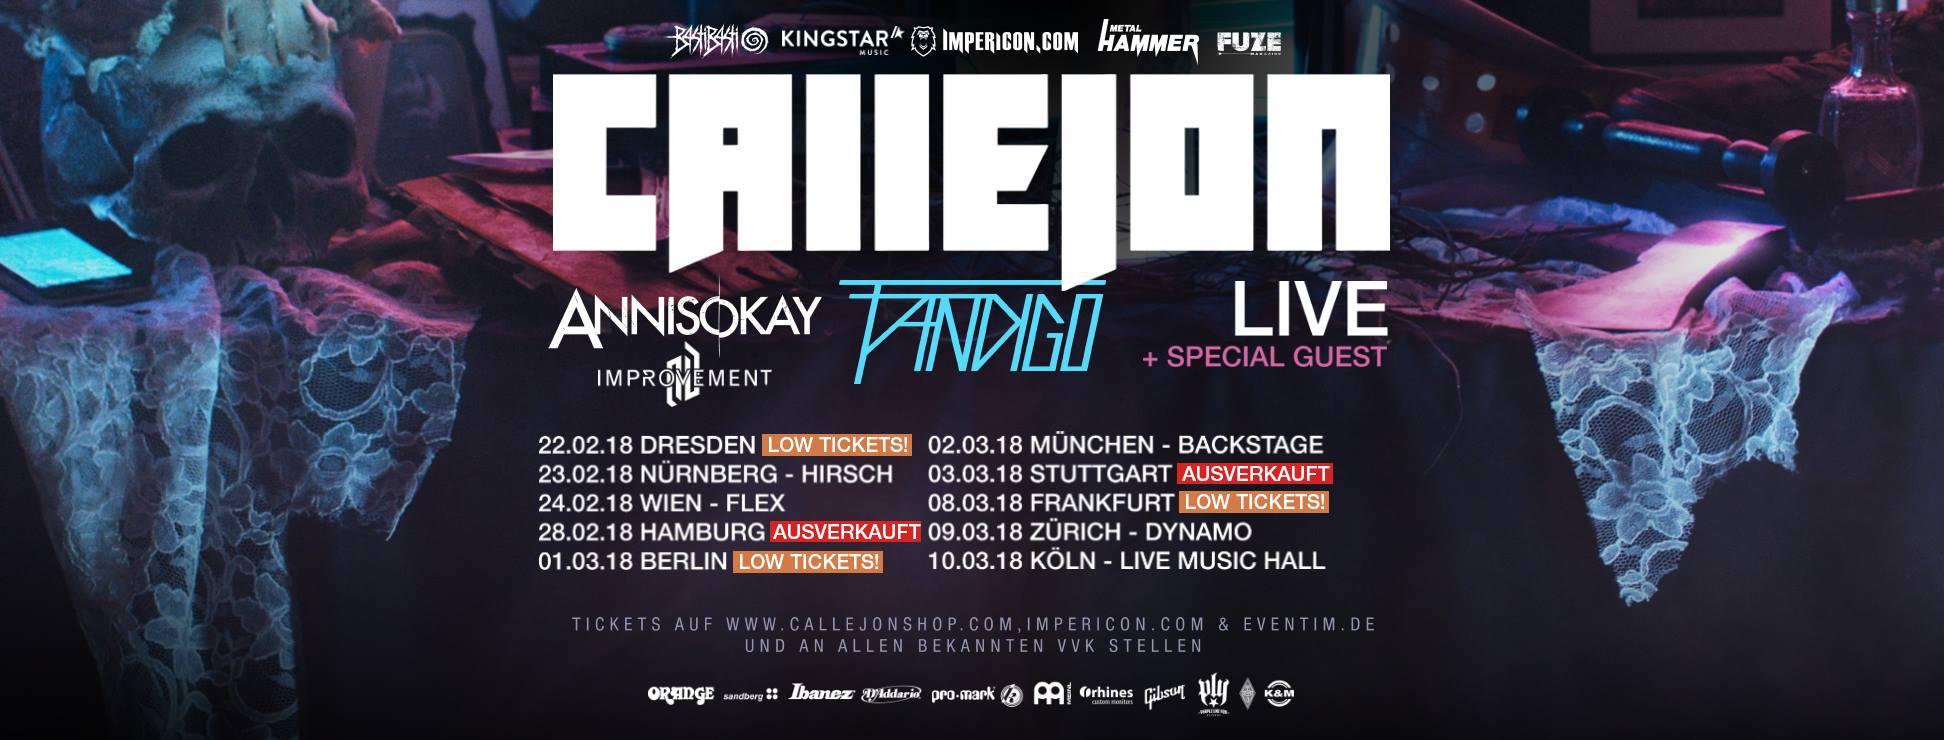 Tourplakat von Callejon 2018